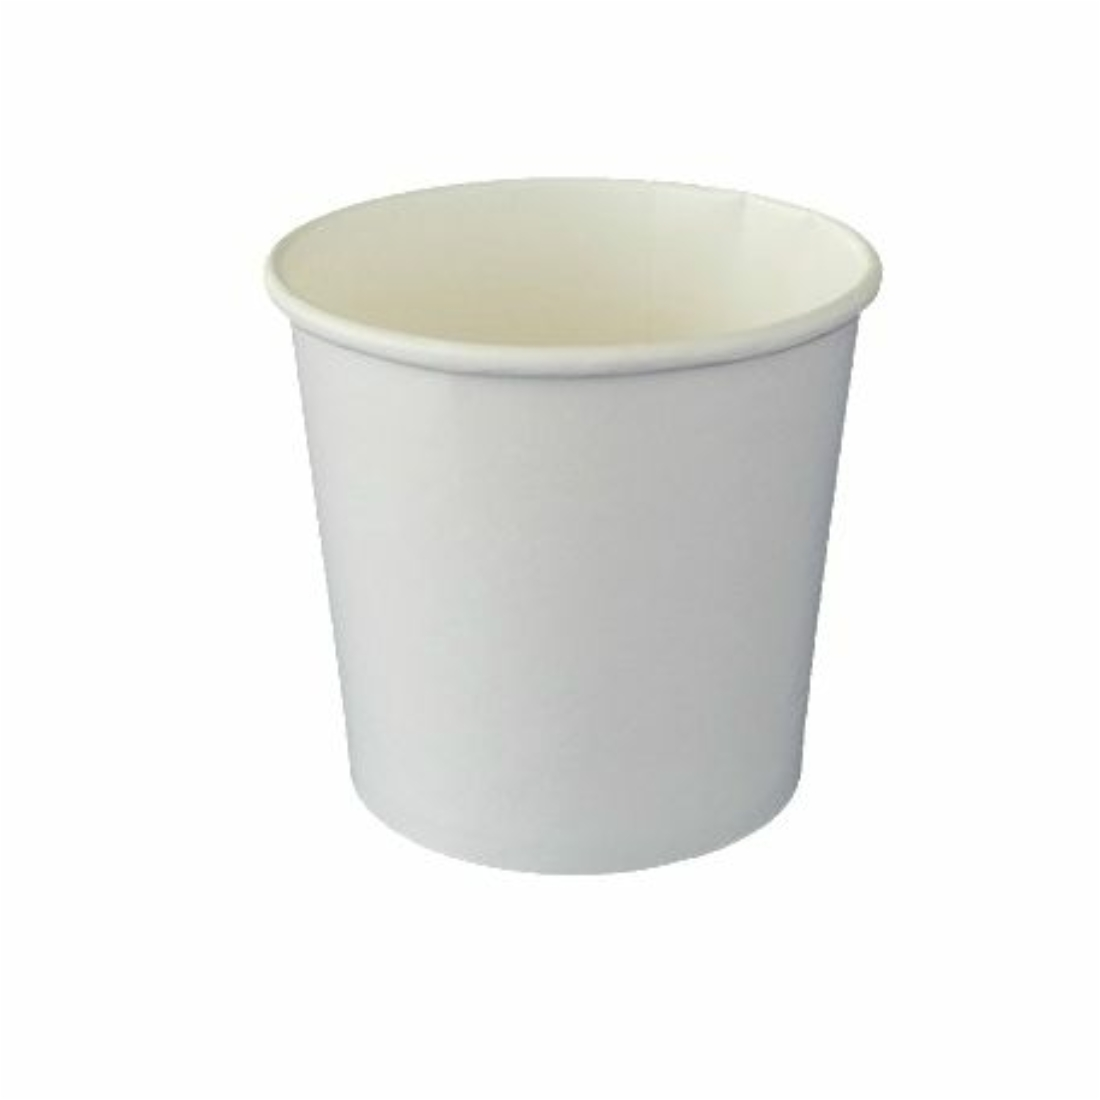 Cukornád leveses tál  425 ml